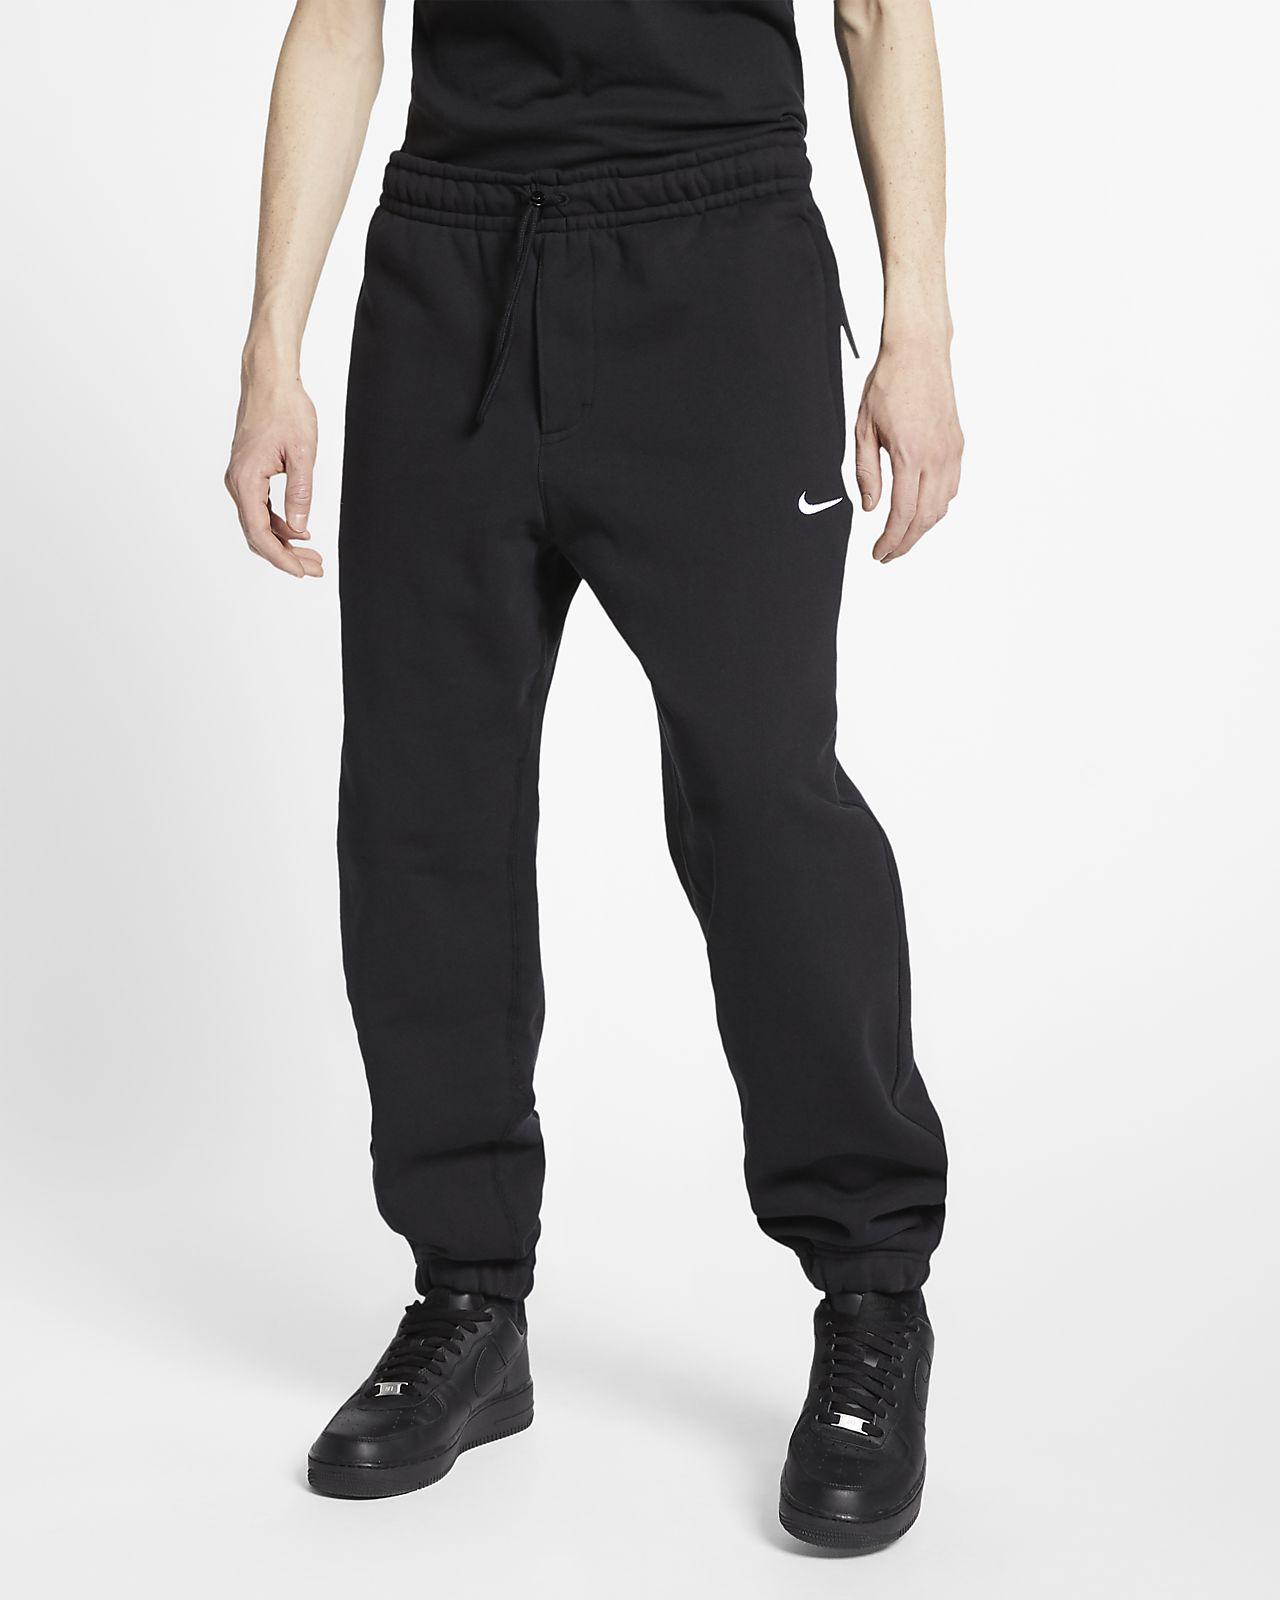 Pantalones de tejido Fleece para hombre NikeLab Collection